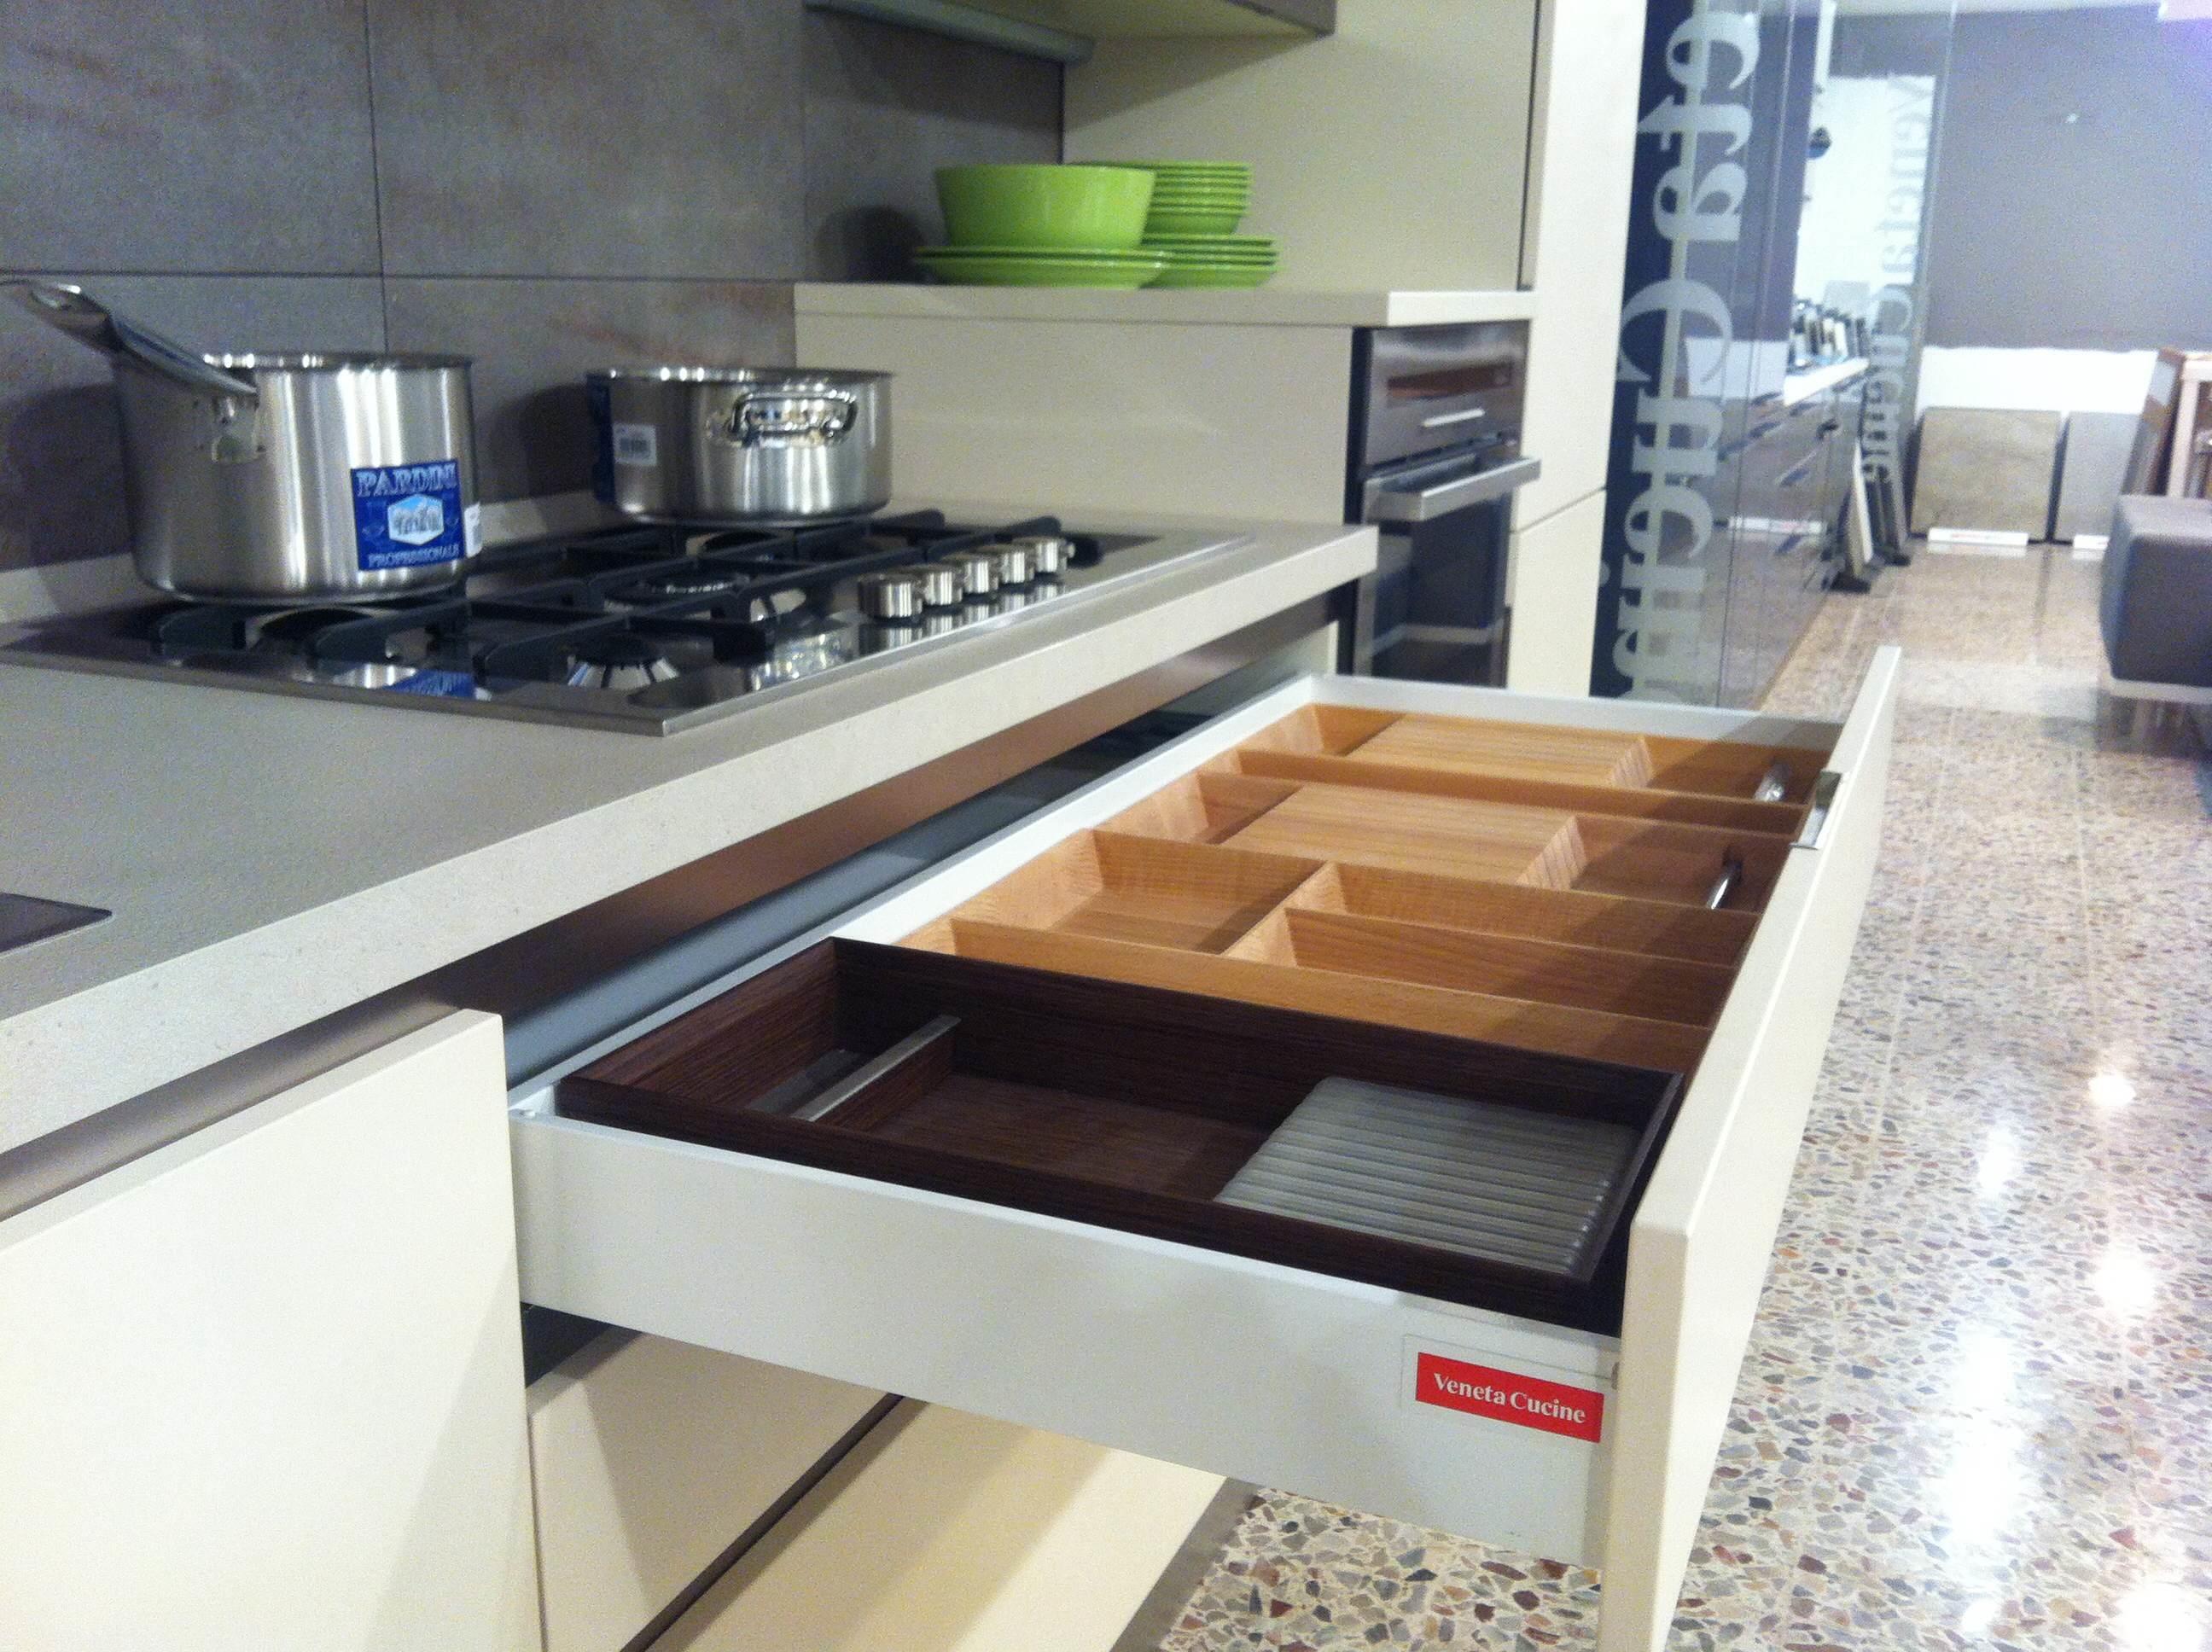 Cucina veneta cucine extra go moderna laccato opaco for Casa moderna veneta cucine